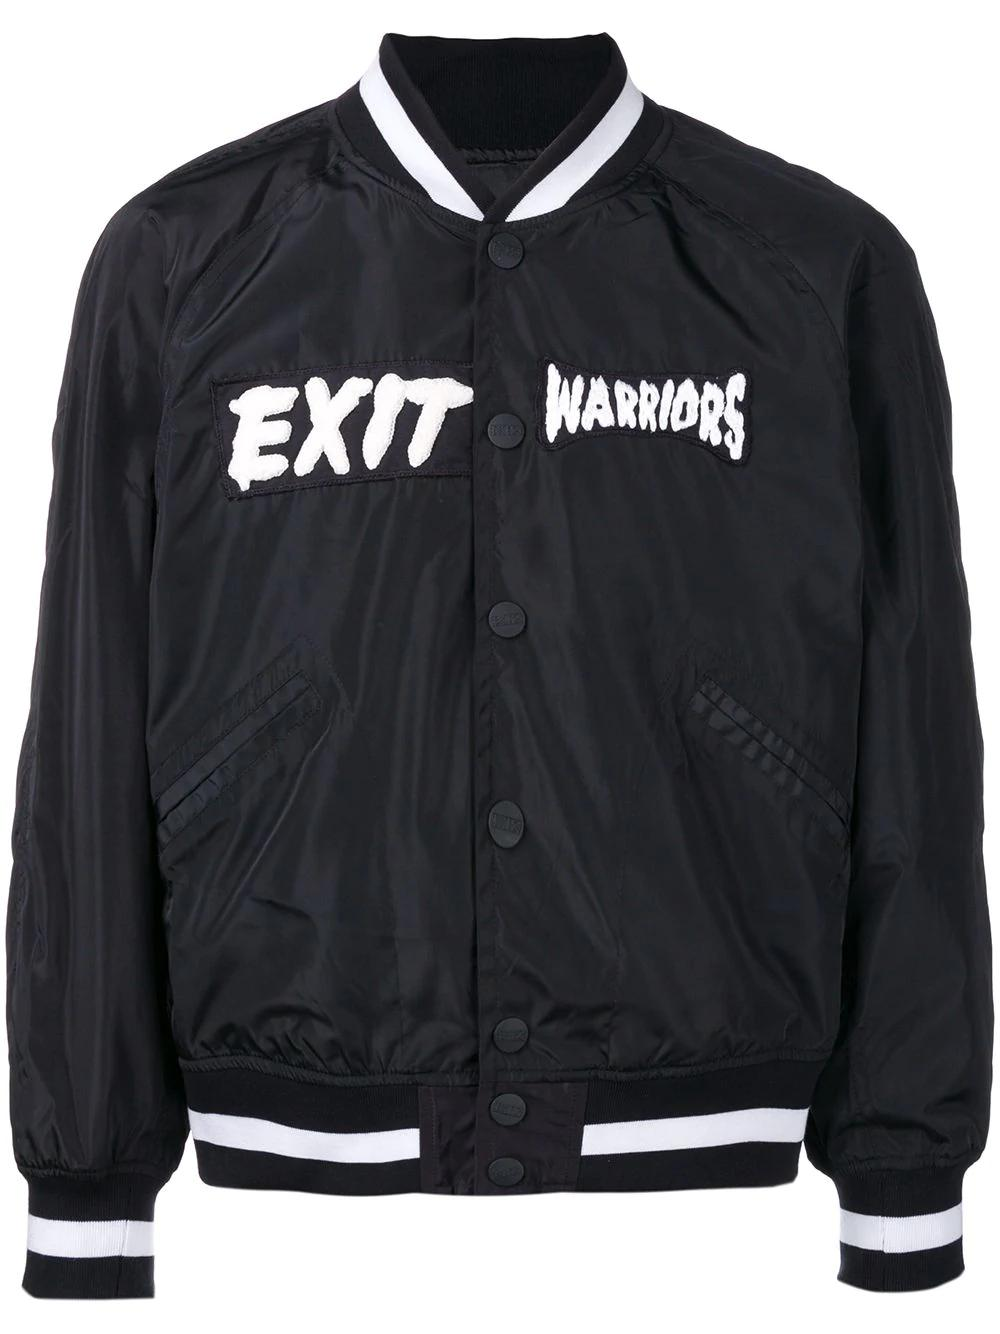 Ktz Zombie Embroidered Bomber Jacket - Black